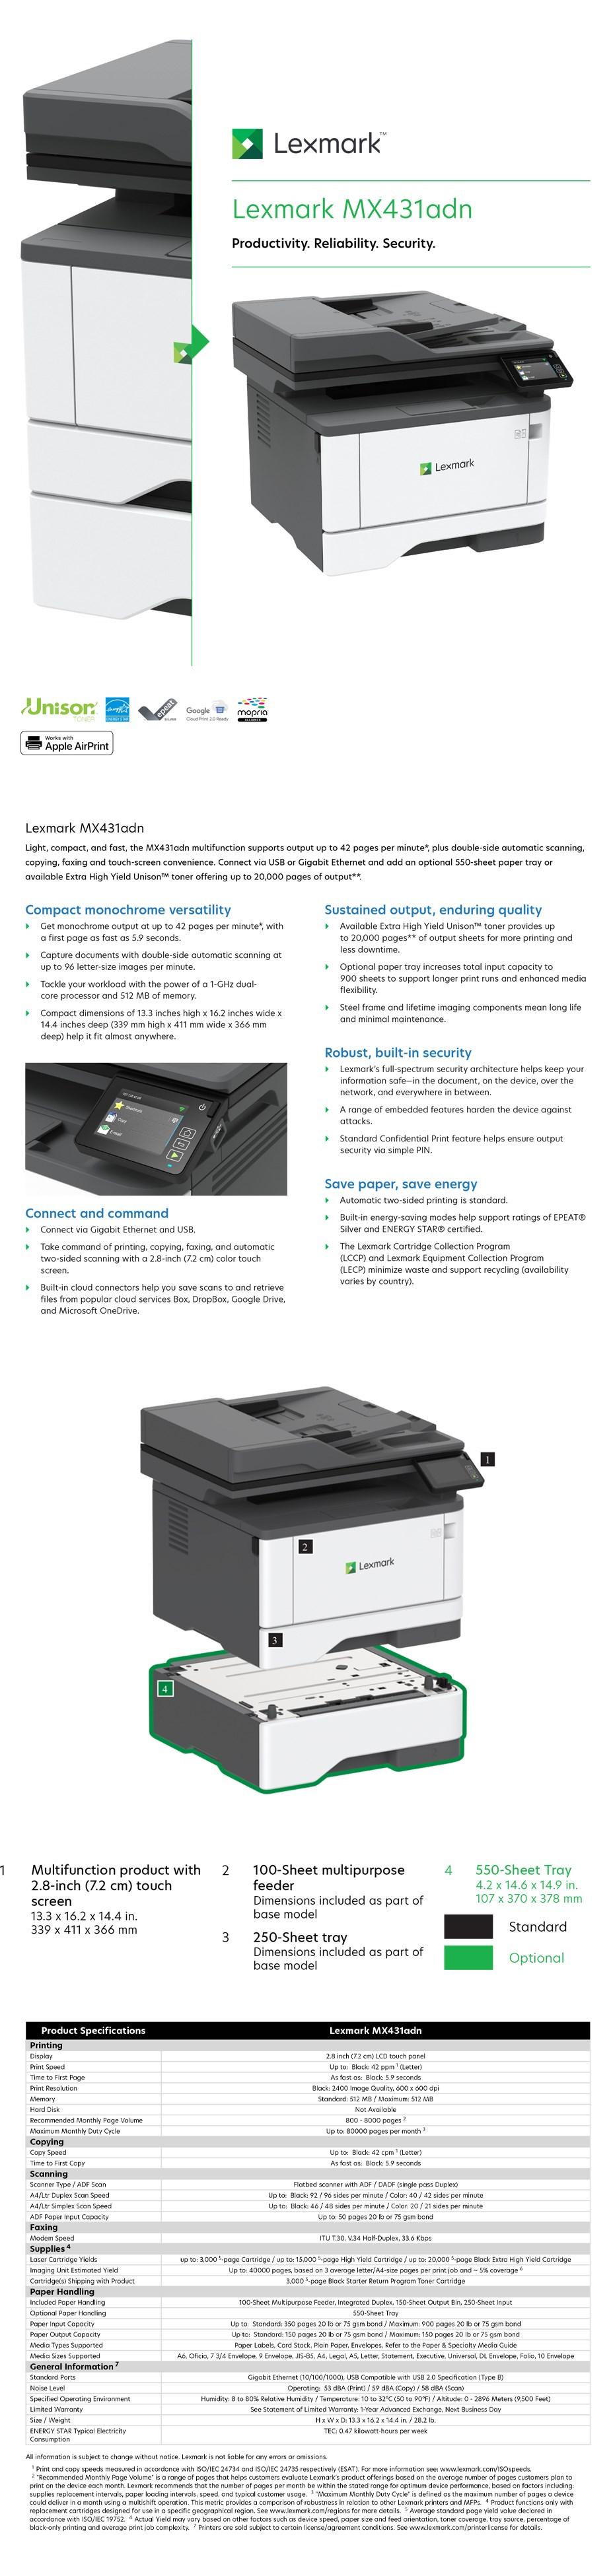 Lexmark MX431adn A4 Monochrome Laser Printer - Overview 1